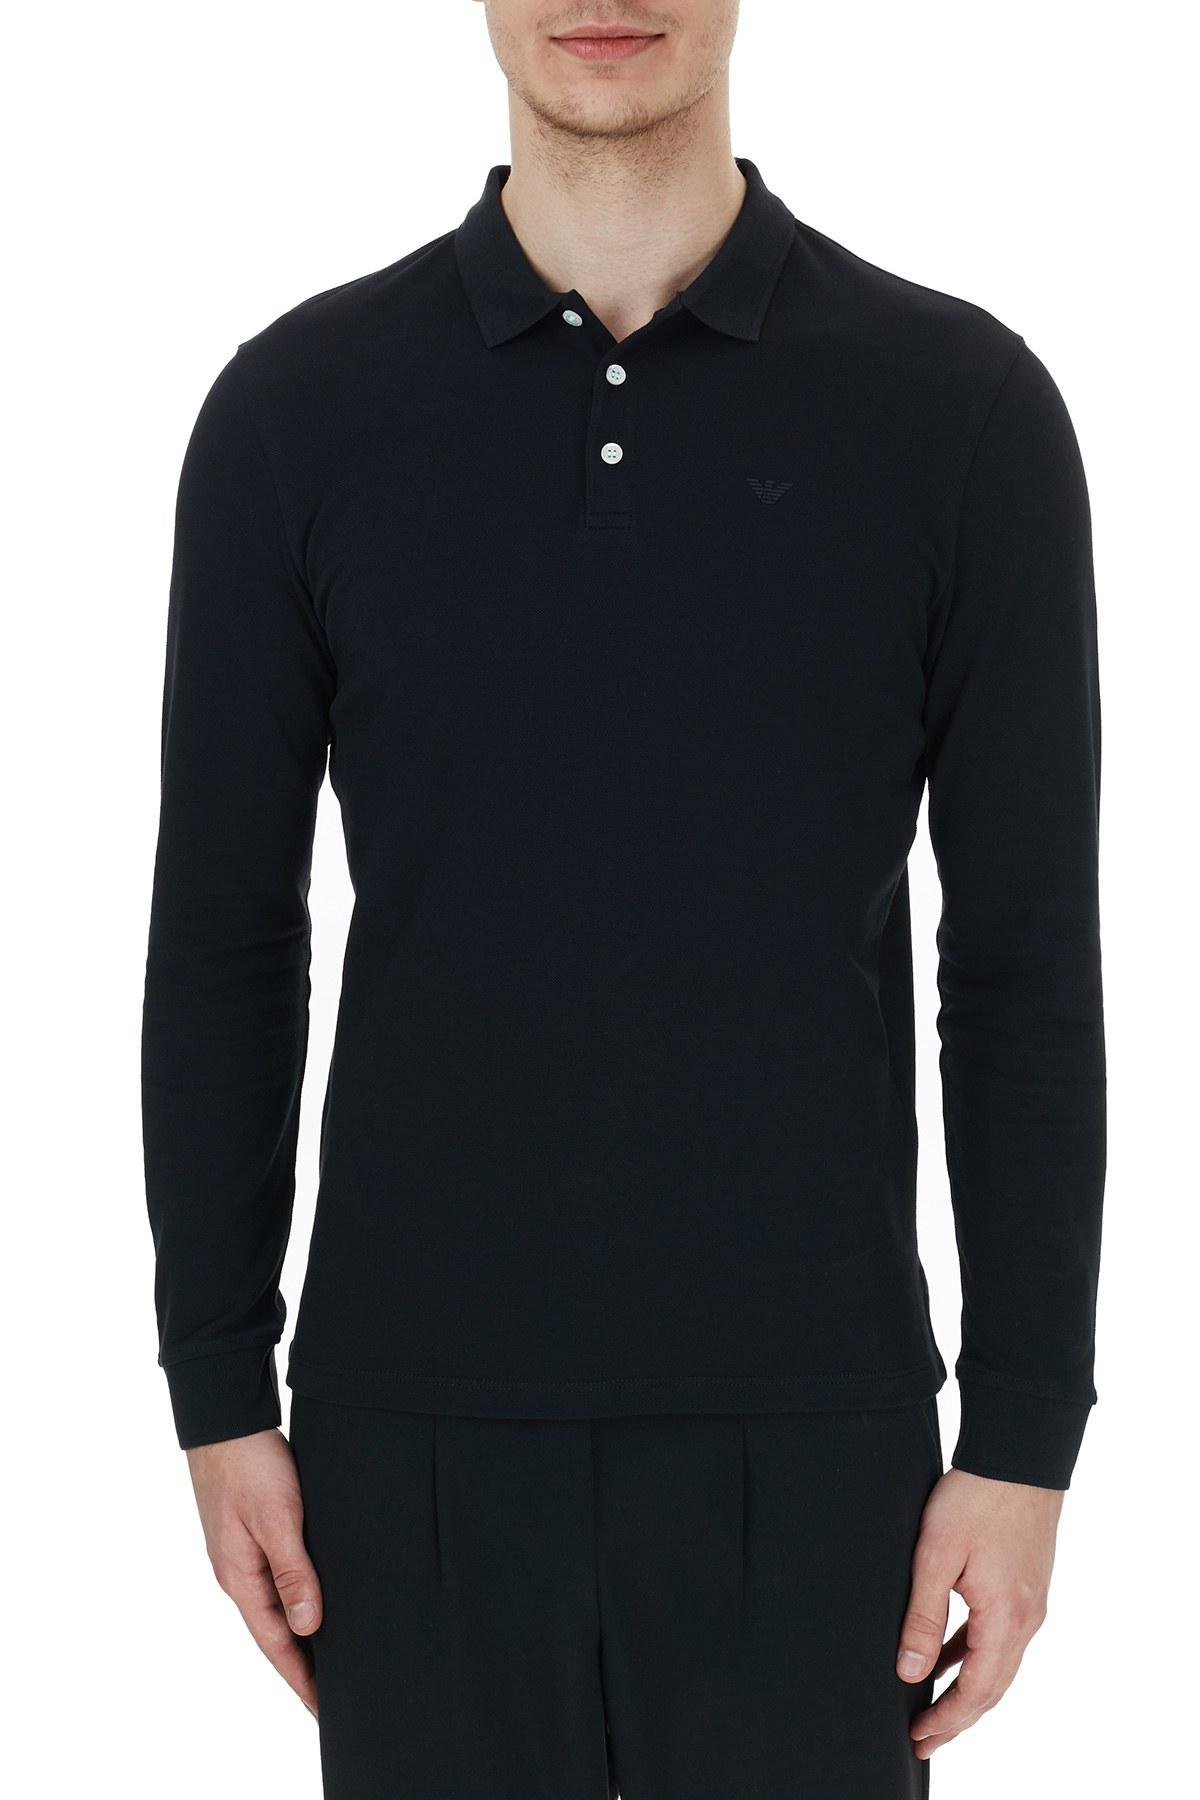 Emporio Armani % 100 Pamuk Düğmeli T Shirt Erkek Polo 8N1F13 1J0SZ 0999 SİYAH